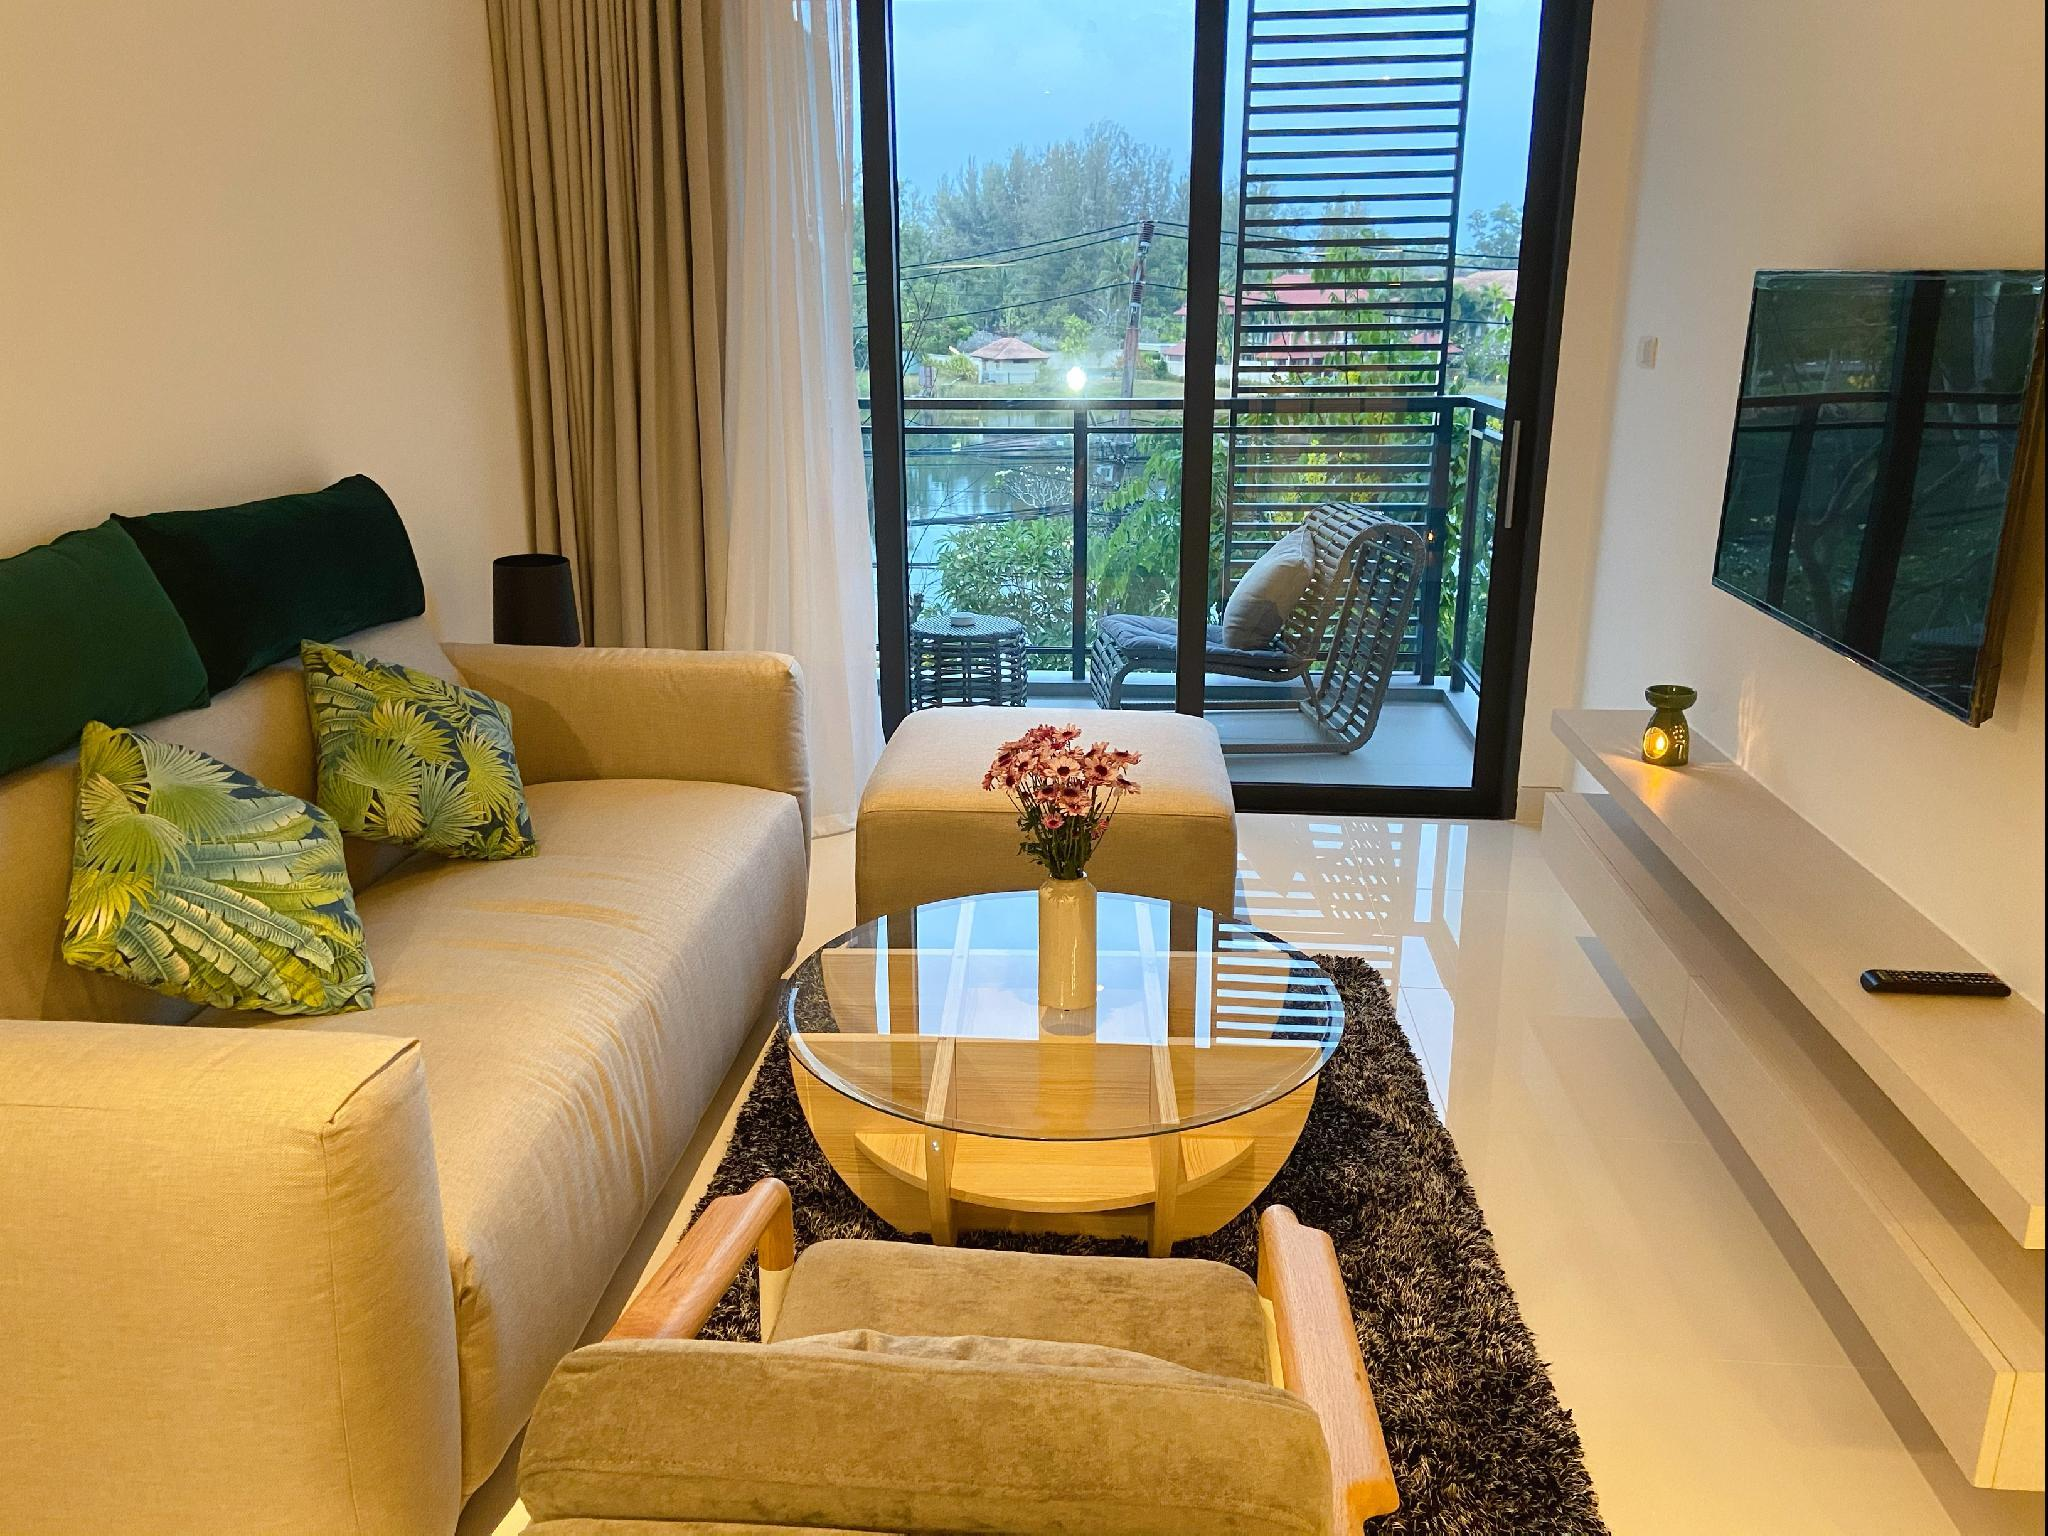 2 bedrooms apt in Cassia Residences